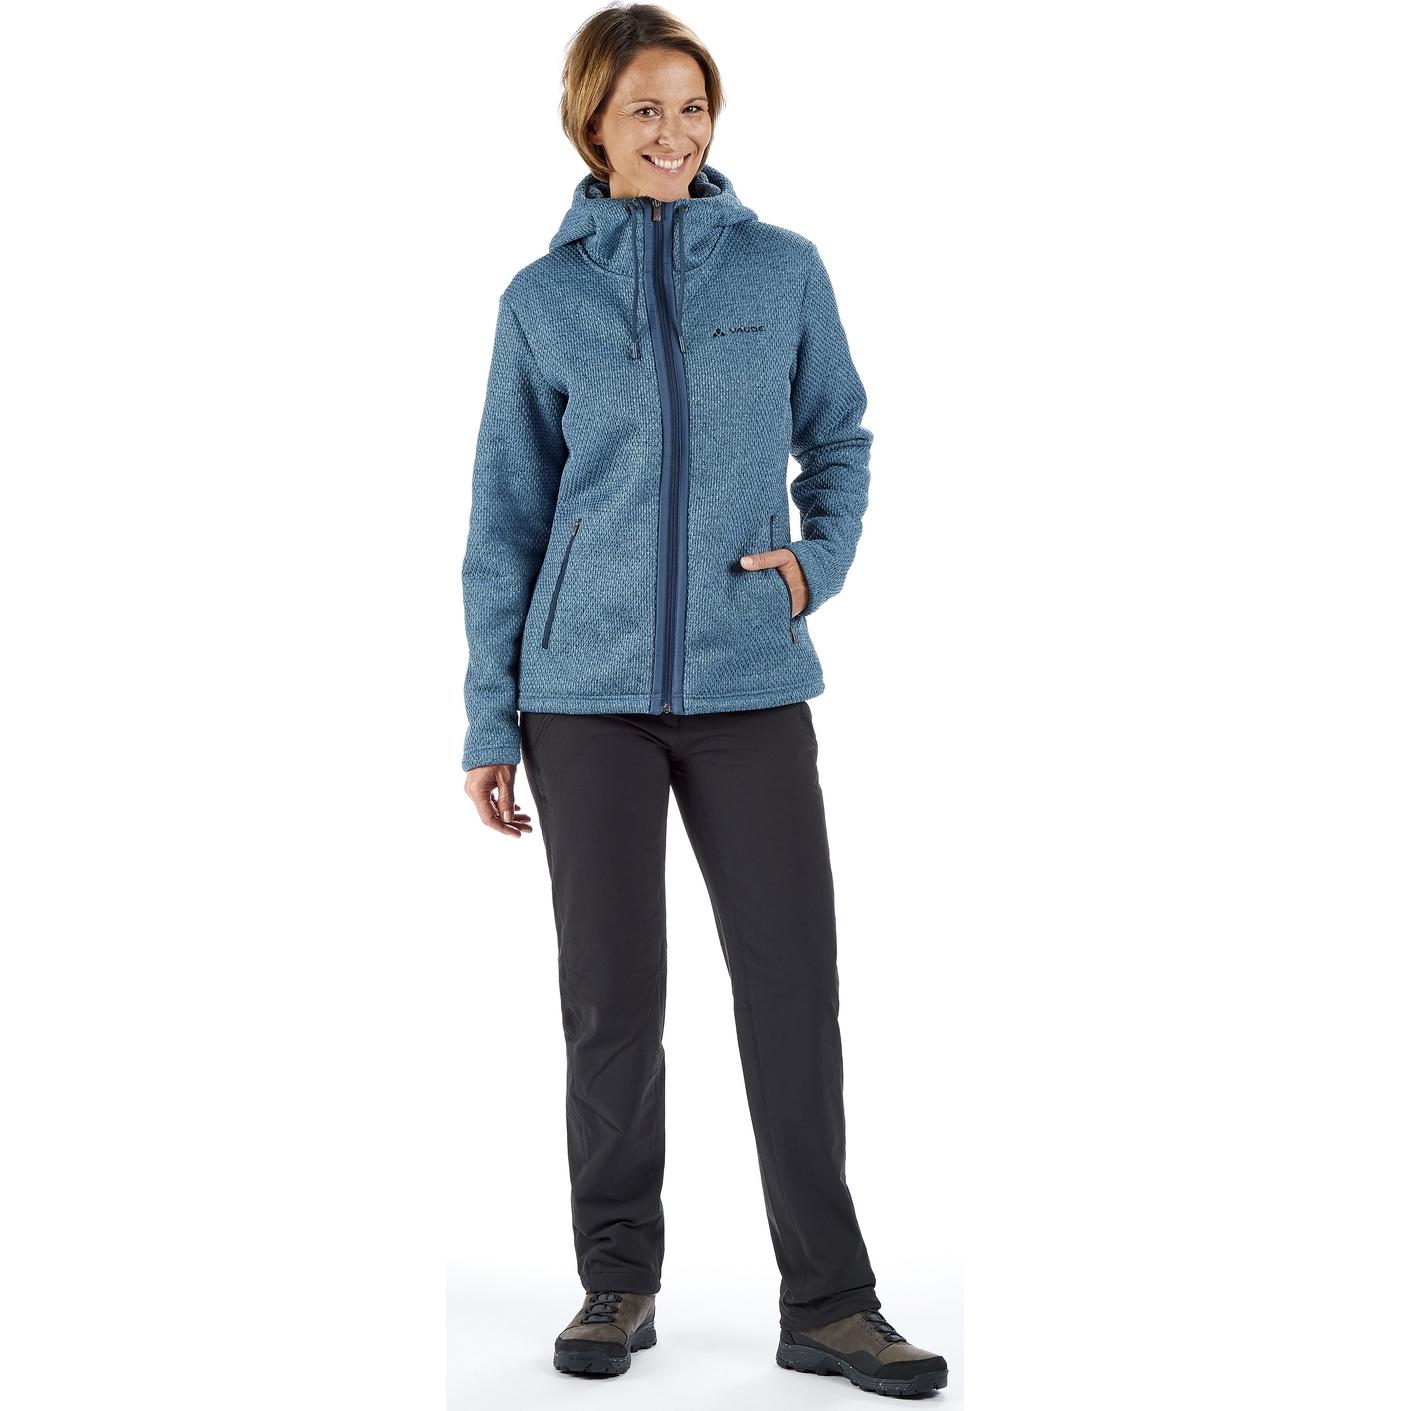 Image of Vaude Women's Skomer Hooded Jacket - blue grey